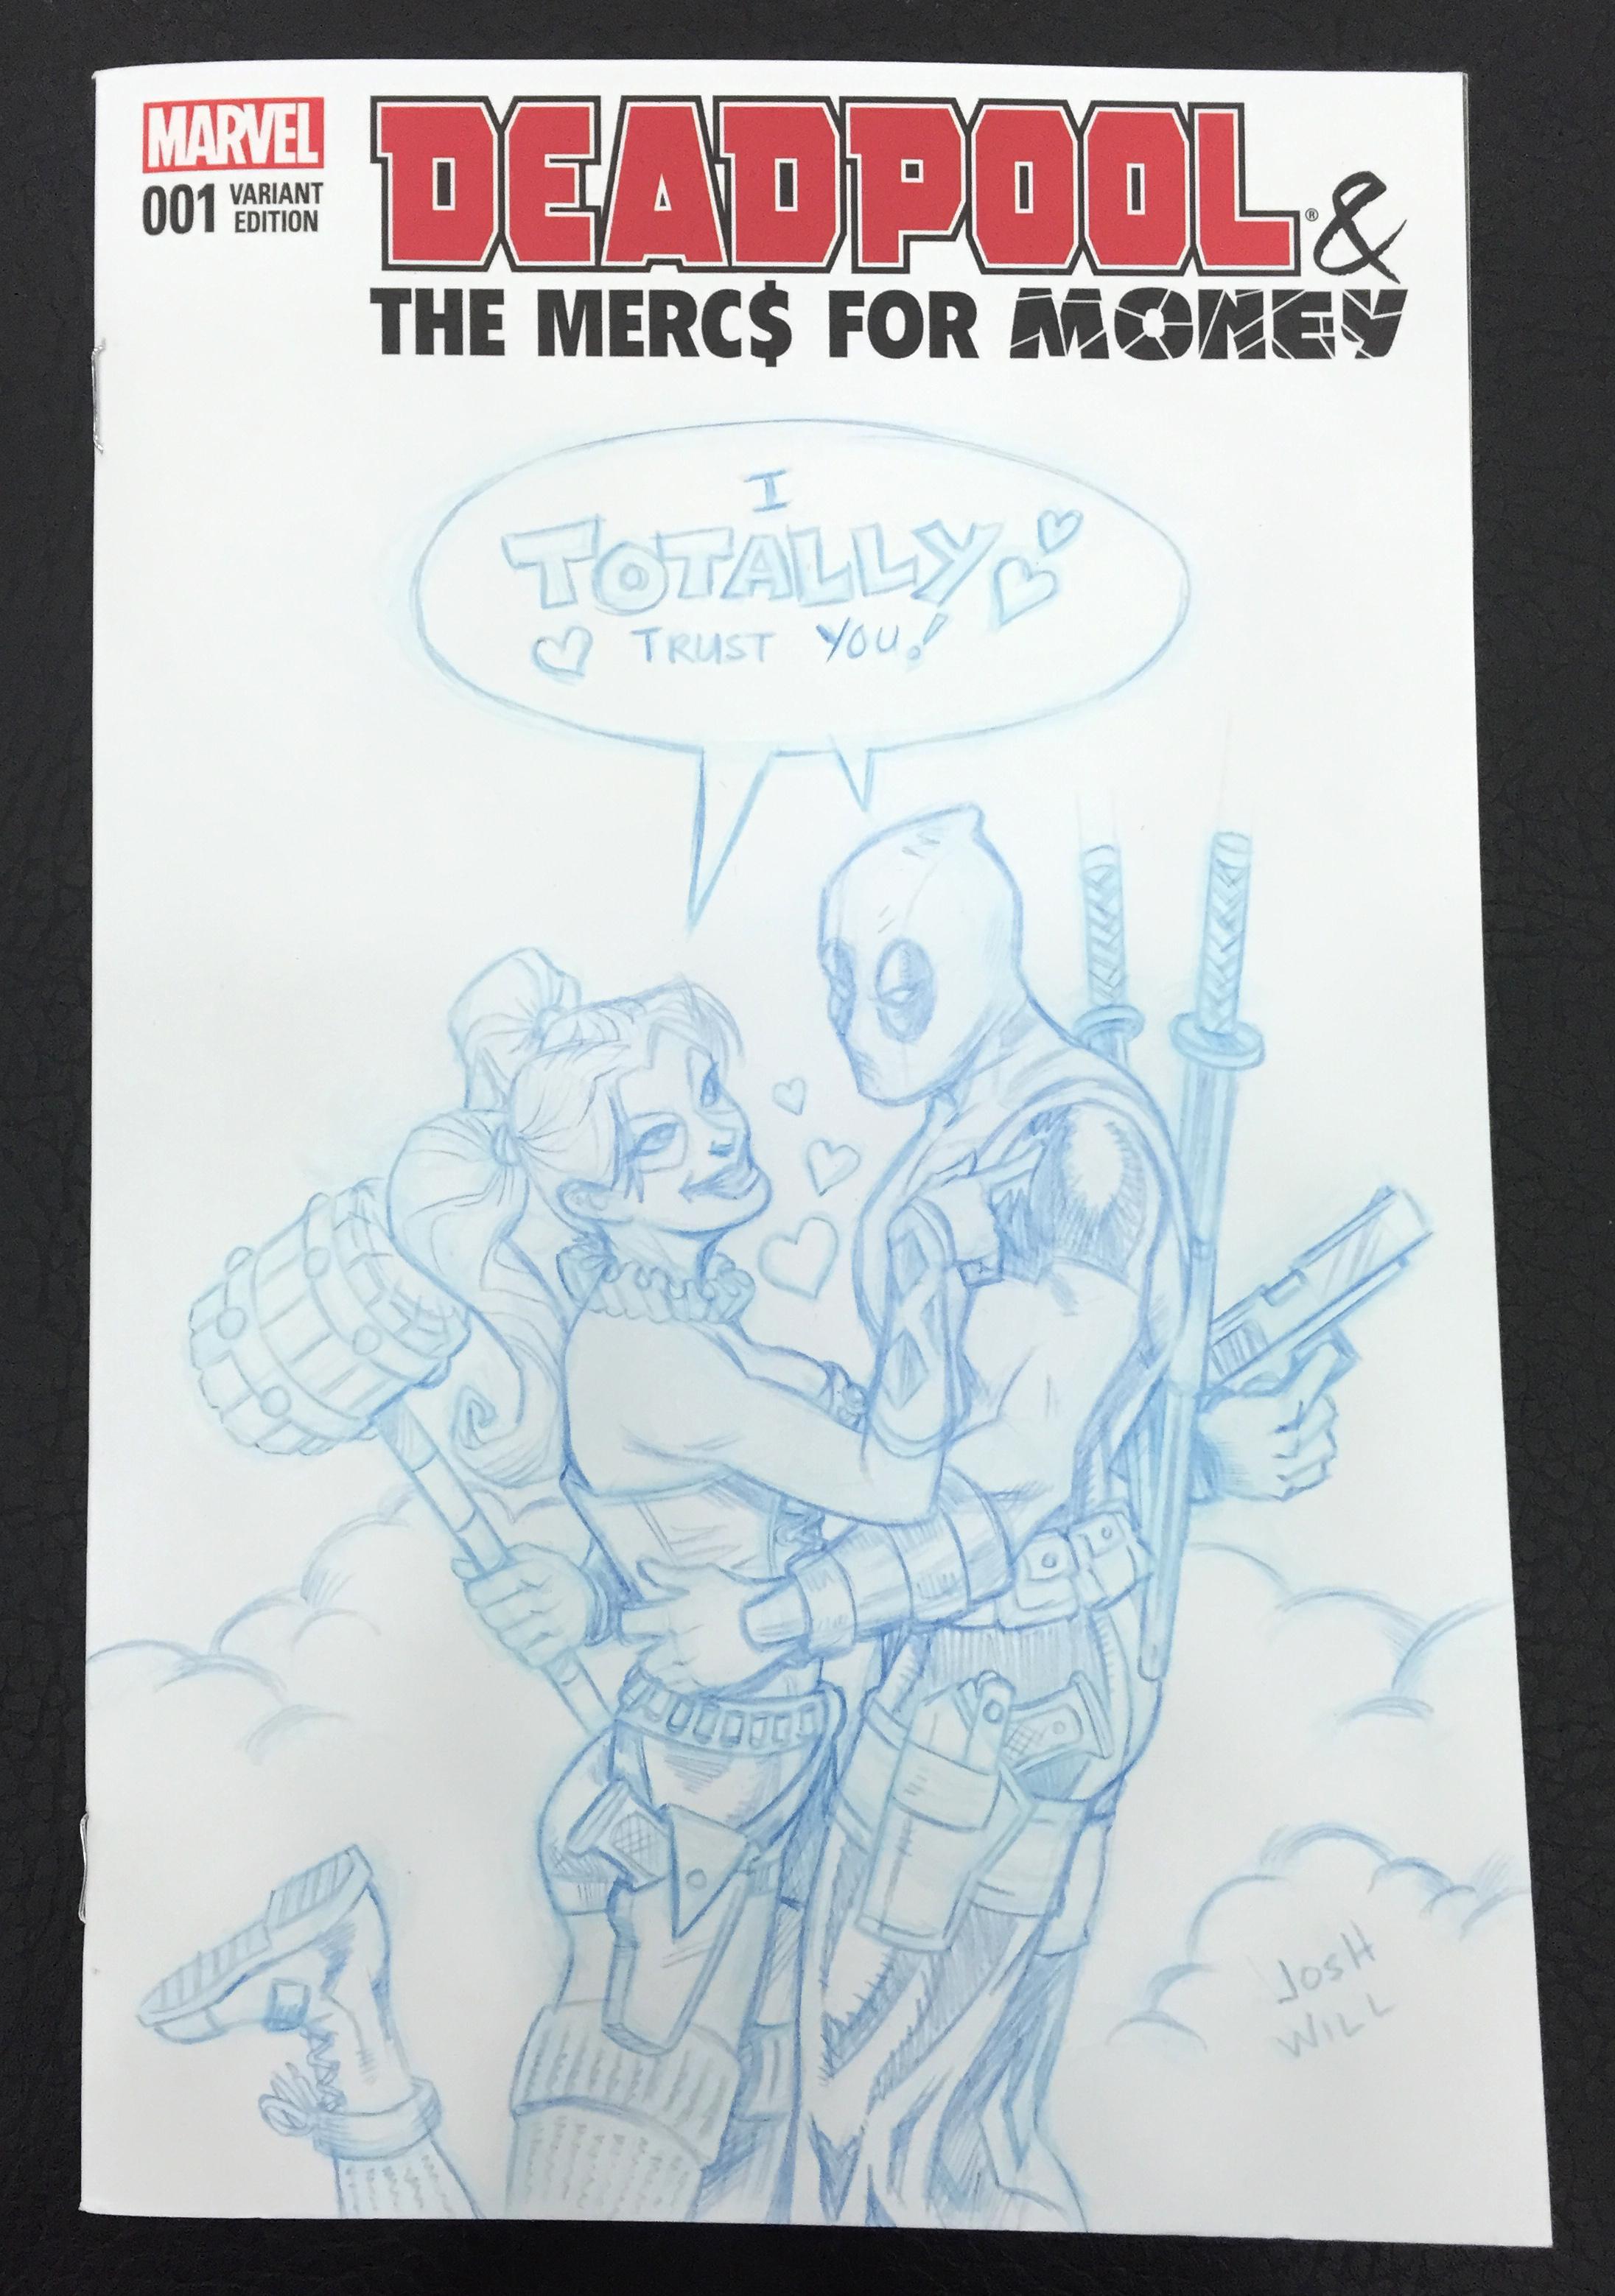 Deadpool & Harley Quinn sketch cover comic - Blue